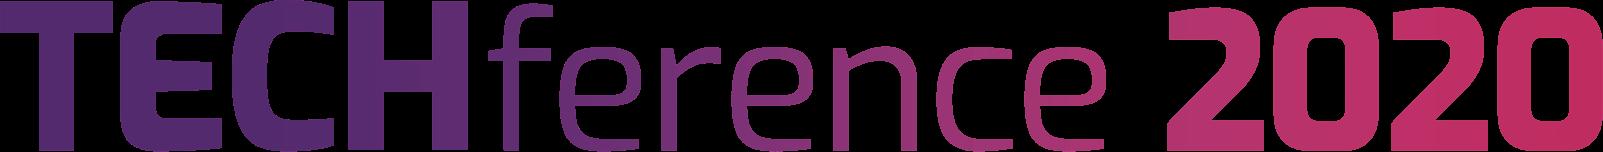 Techference 2020